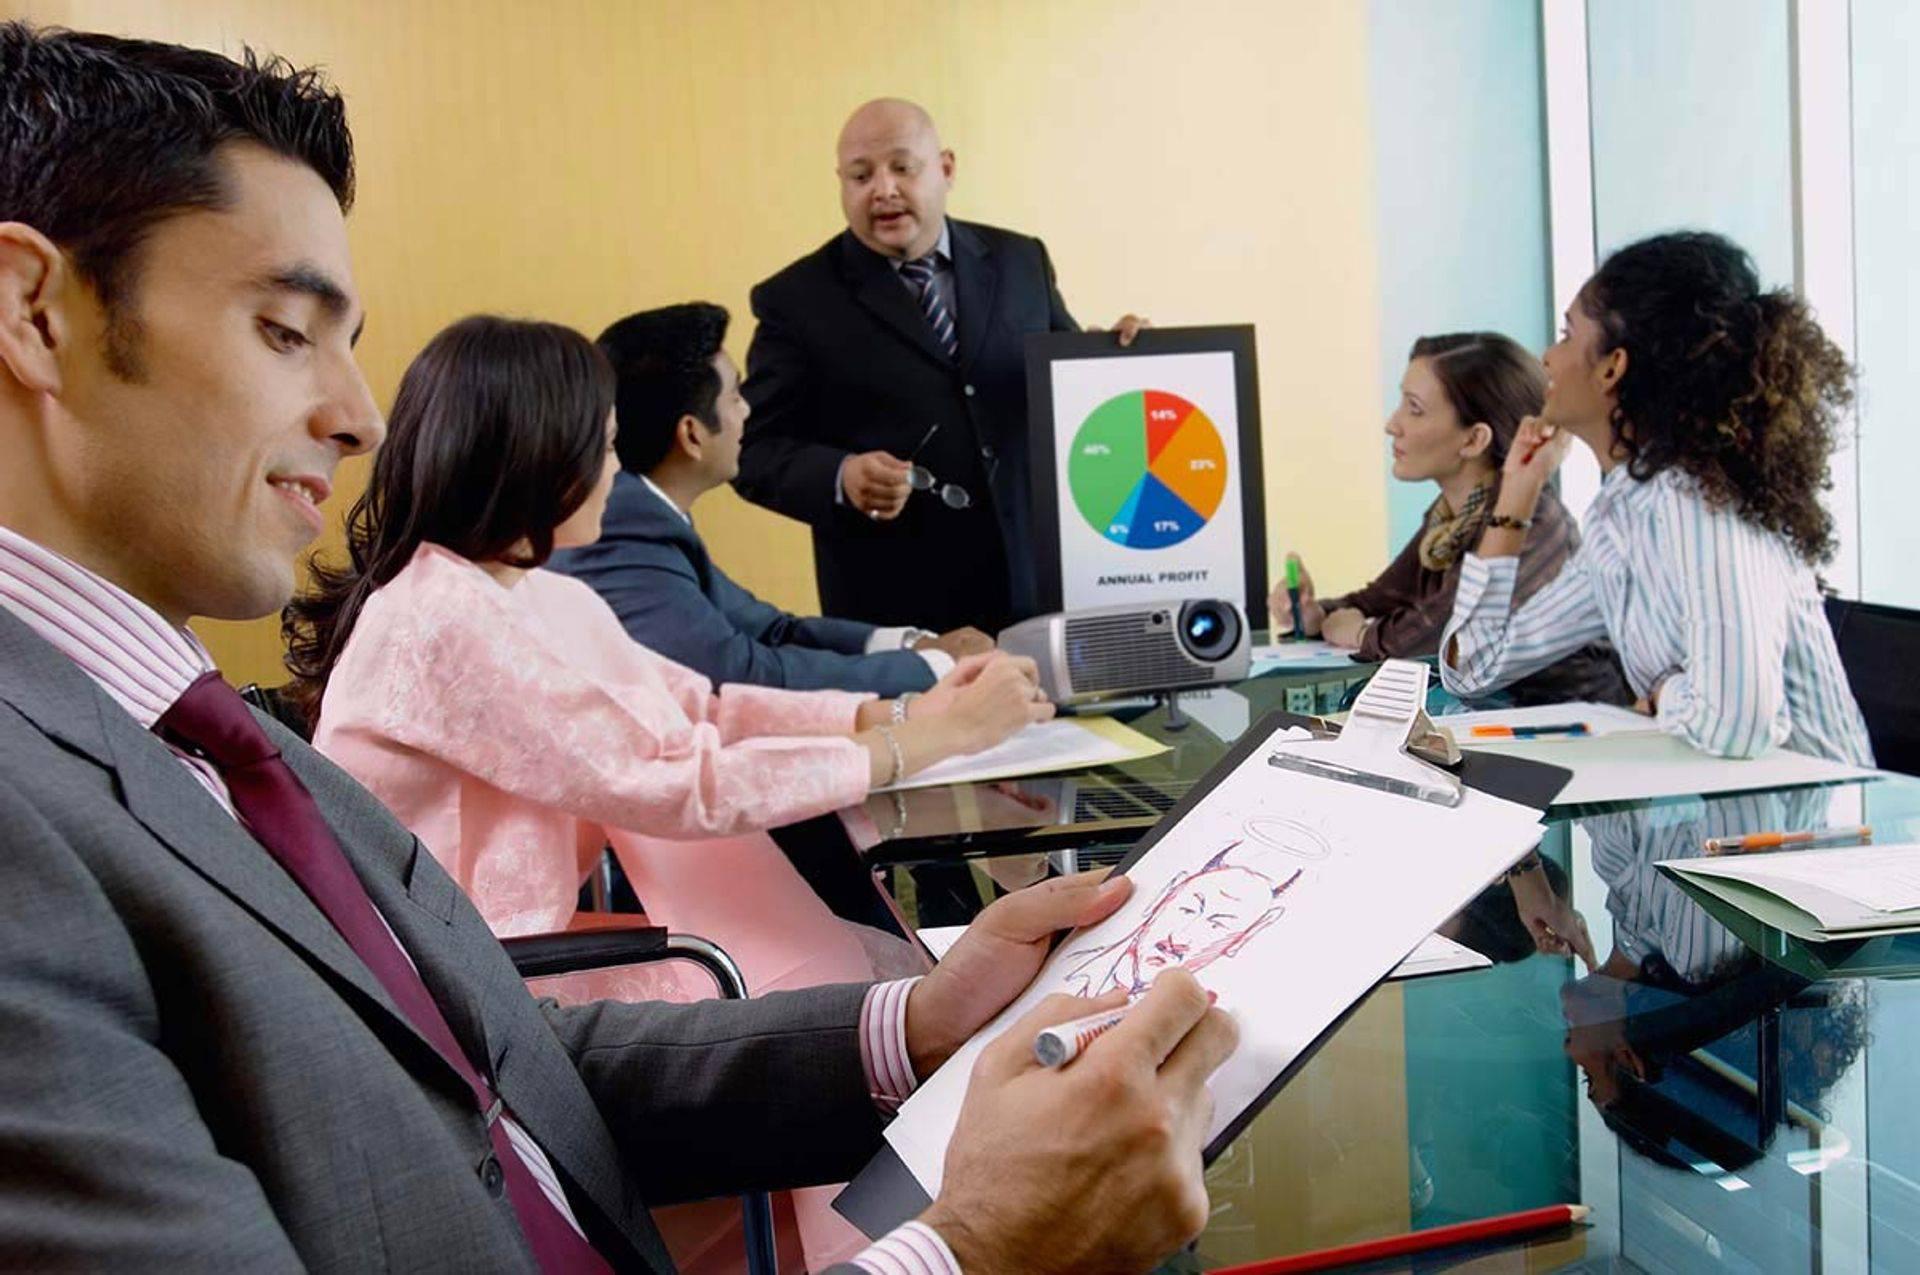 ASTORIA RECRUTEMENT cabinet de recrutement grande distribution